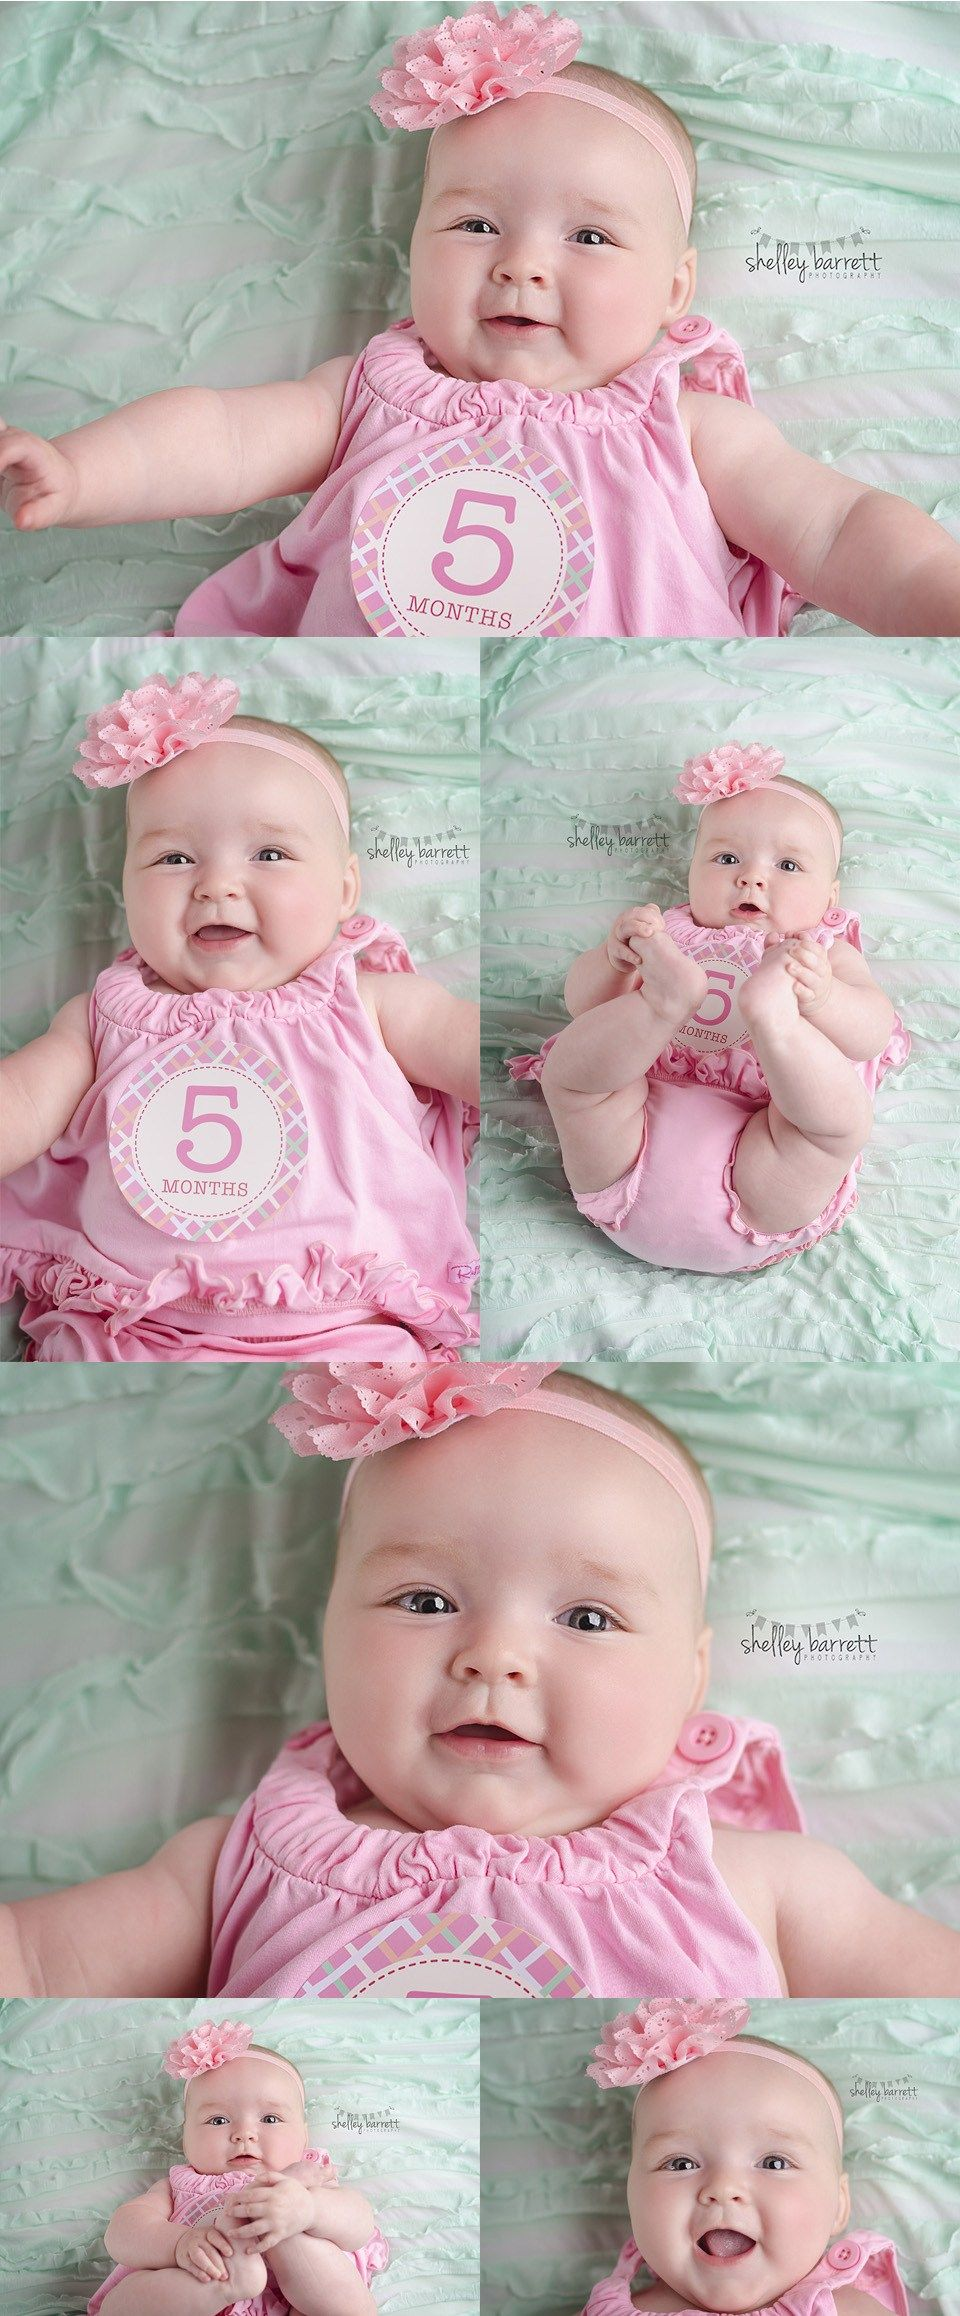 Birmingham & Chelsea. Alabama Baby Photographer   Photographing babies. Alabama baby. 5 month old baby